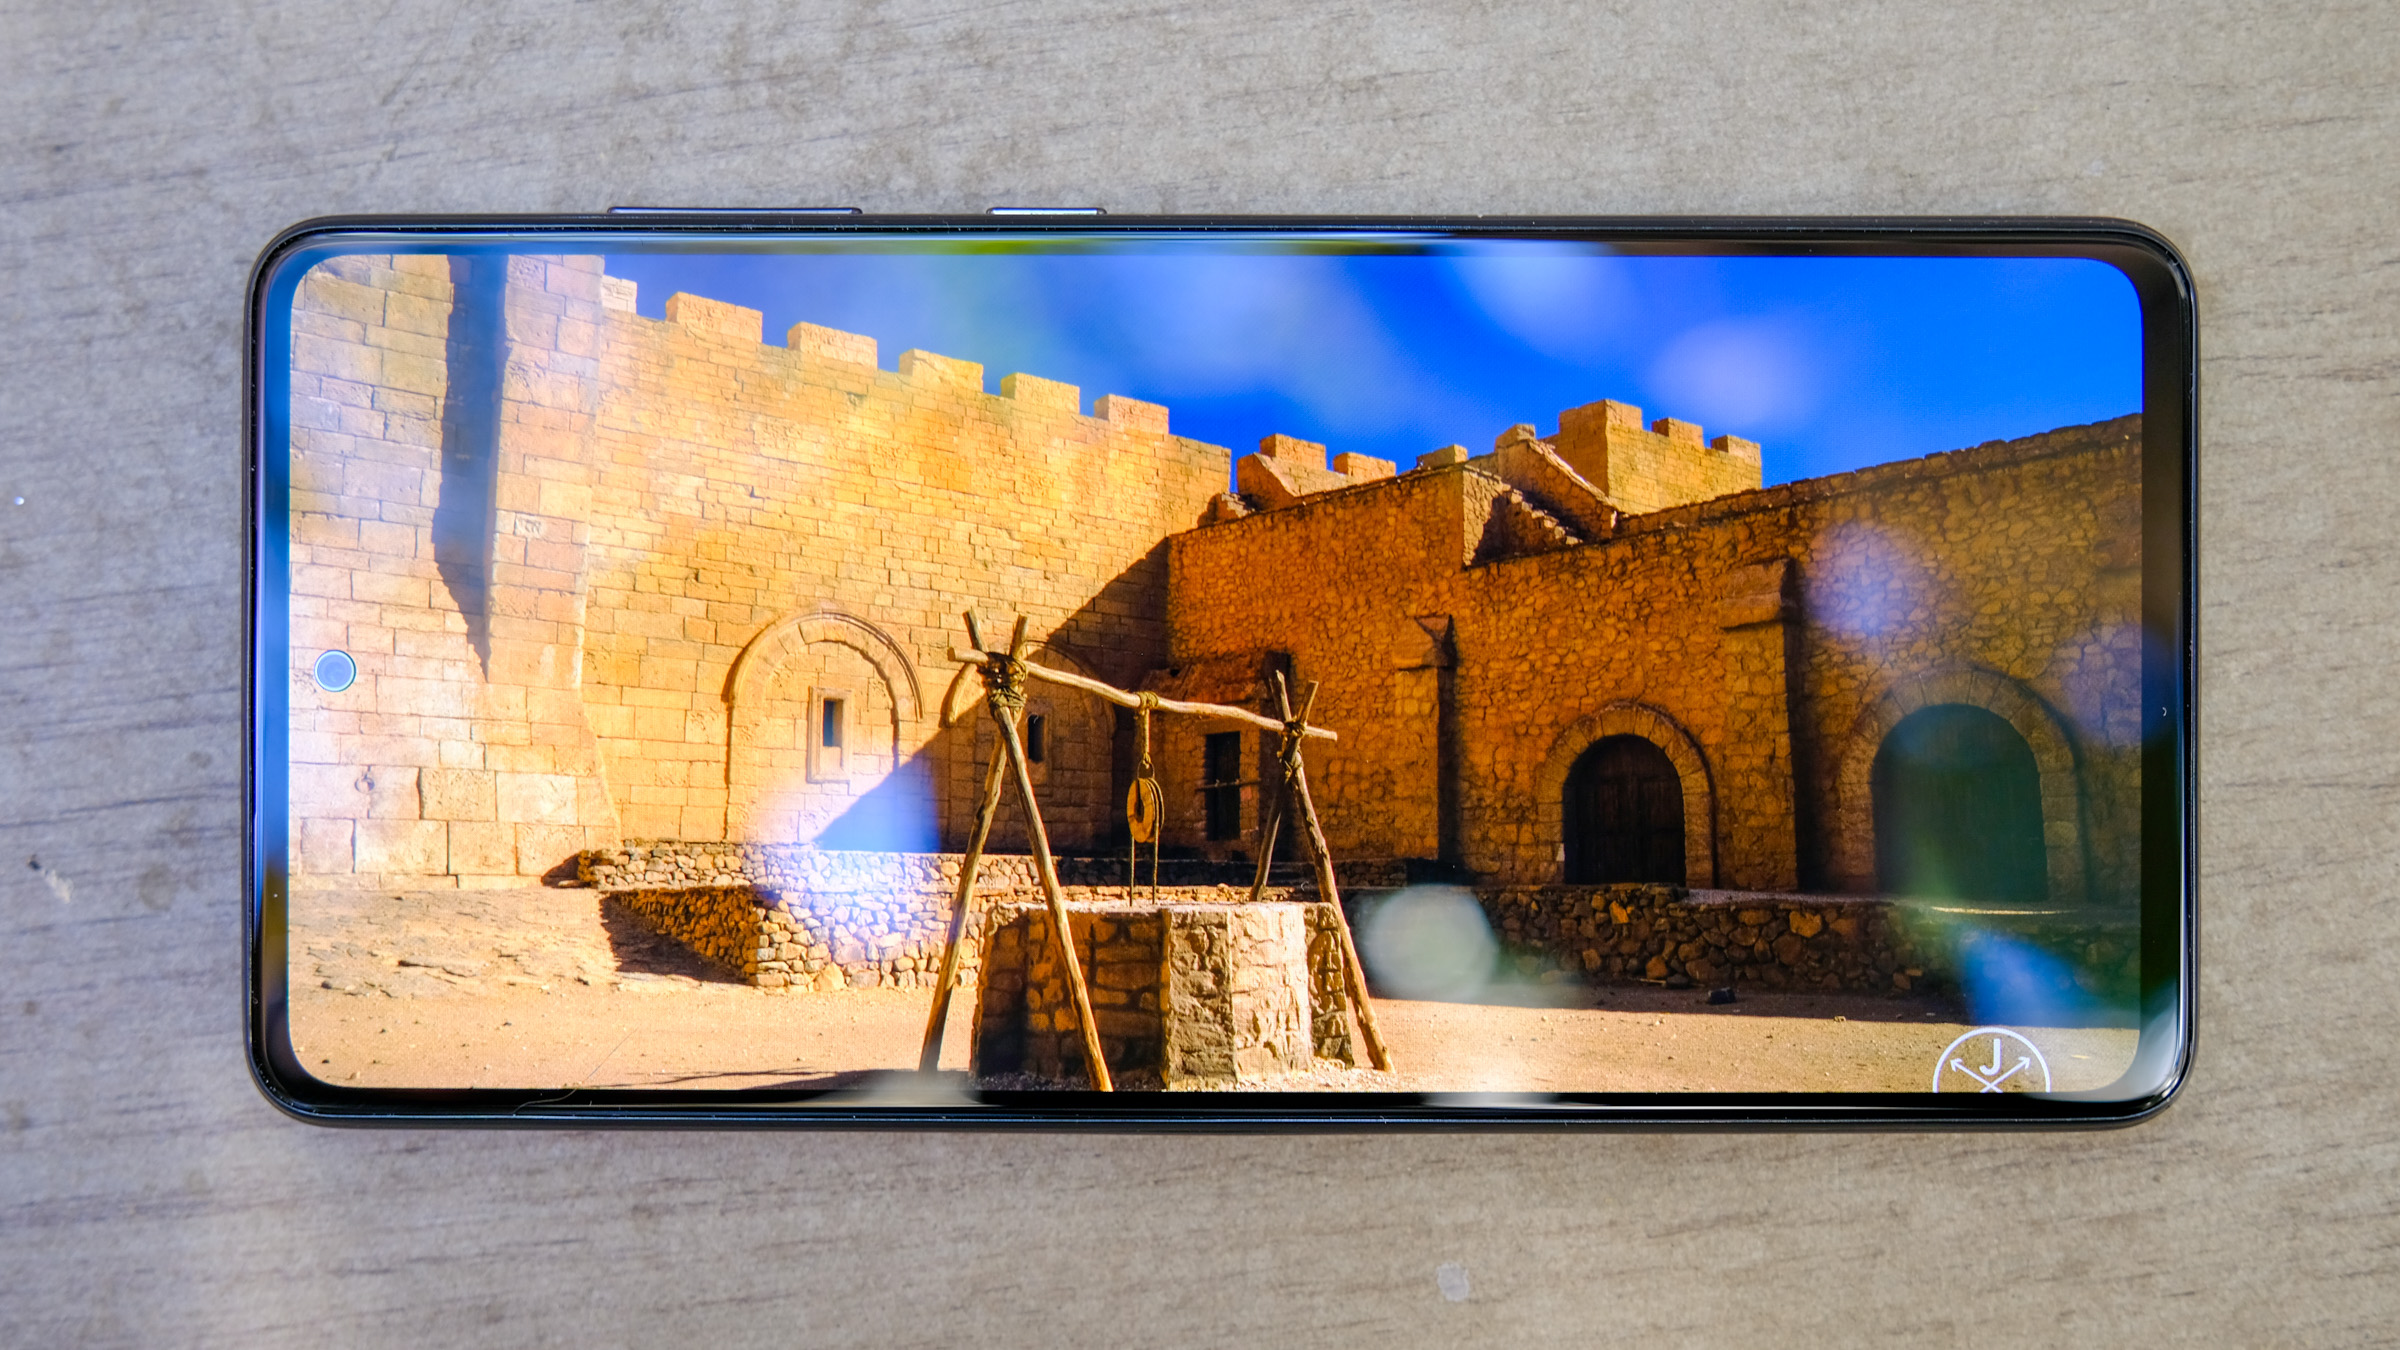 <p>Samsung Galaxy A52 5G hands-on photos</p>